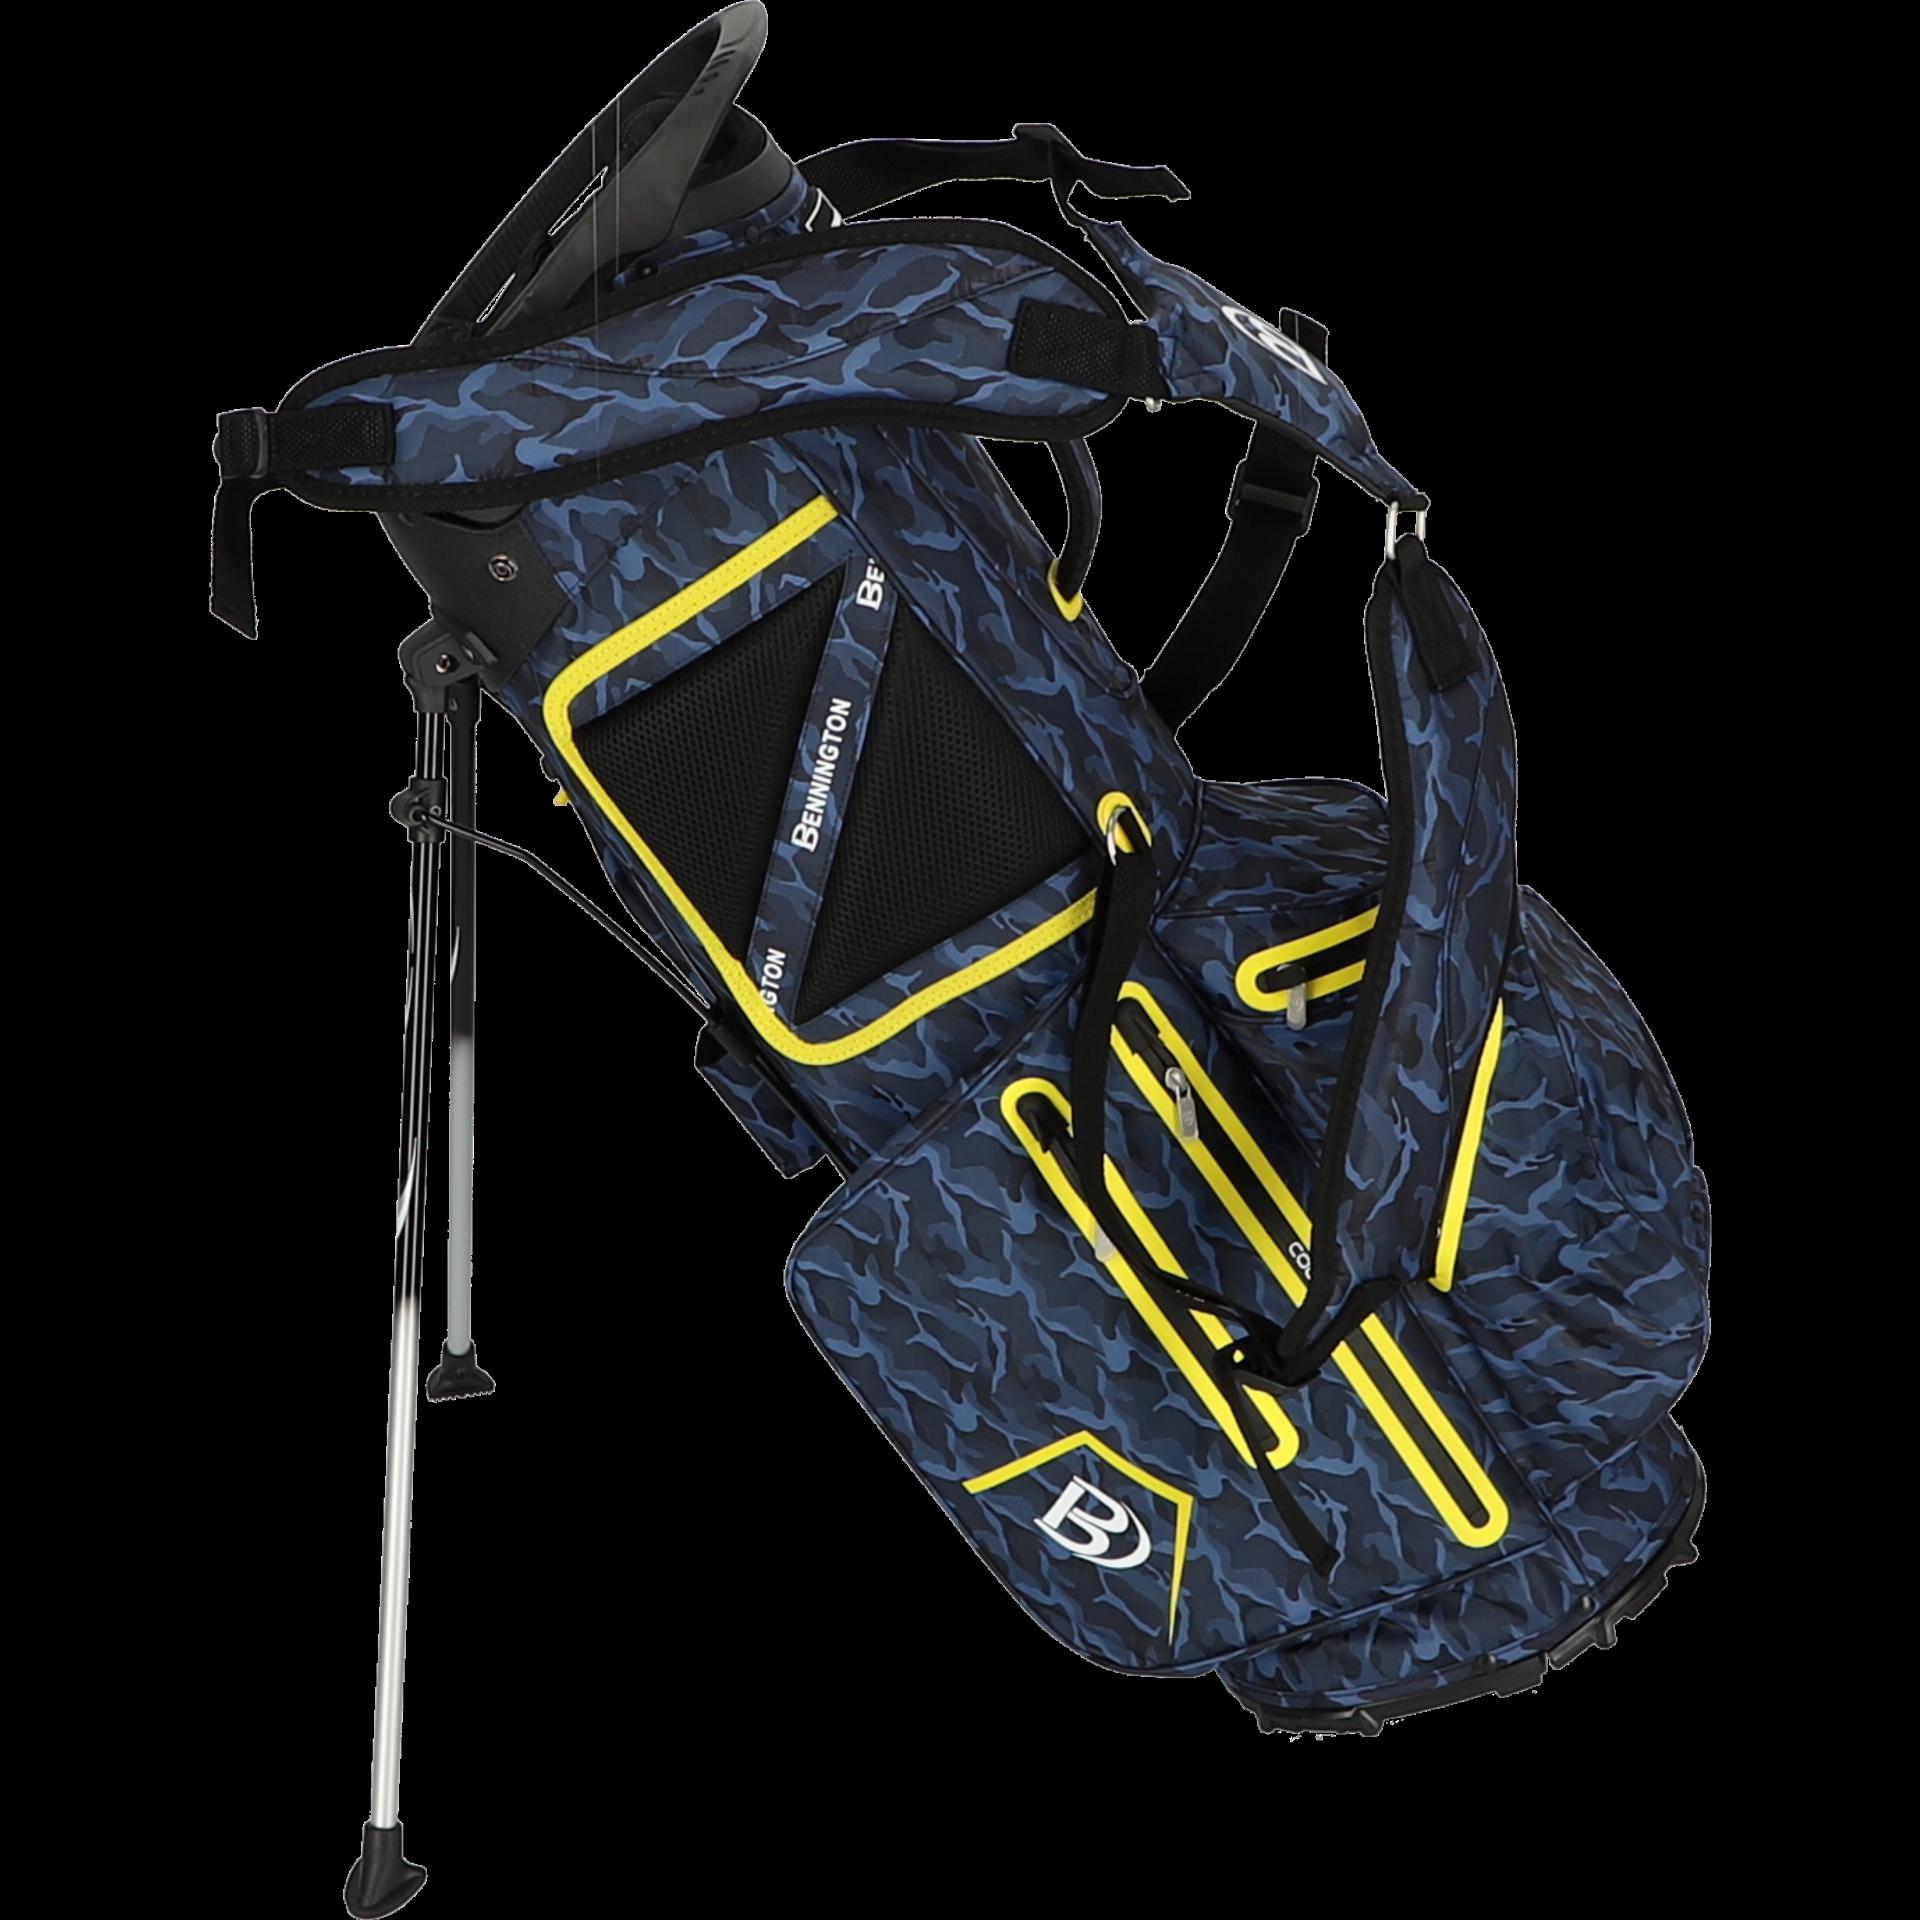 Zone 14 Waterproof Standbag